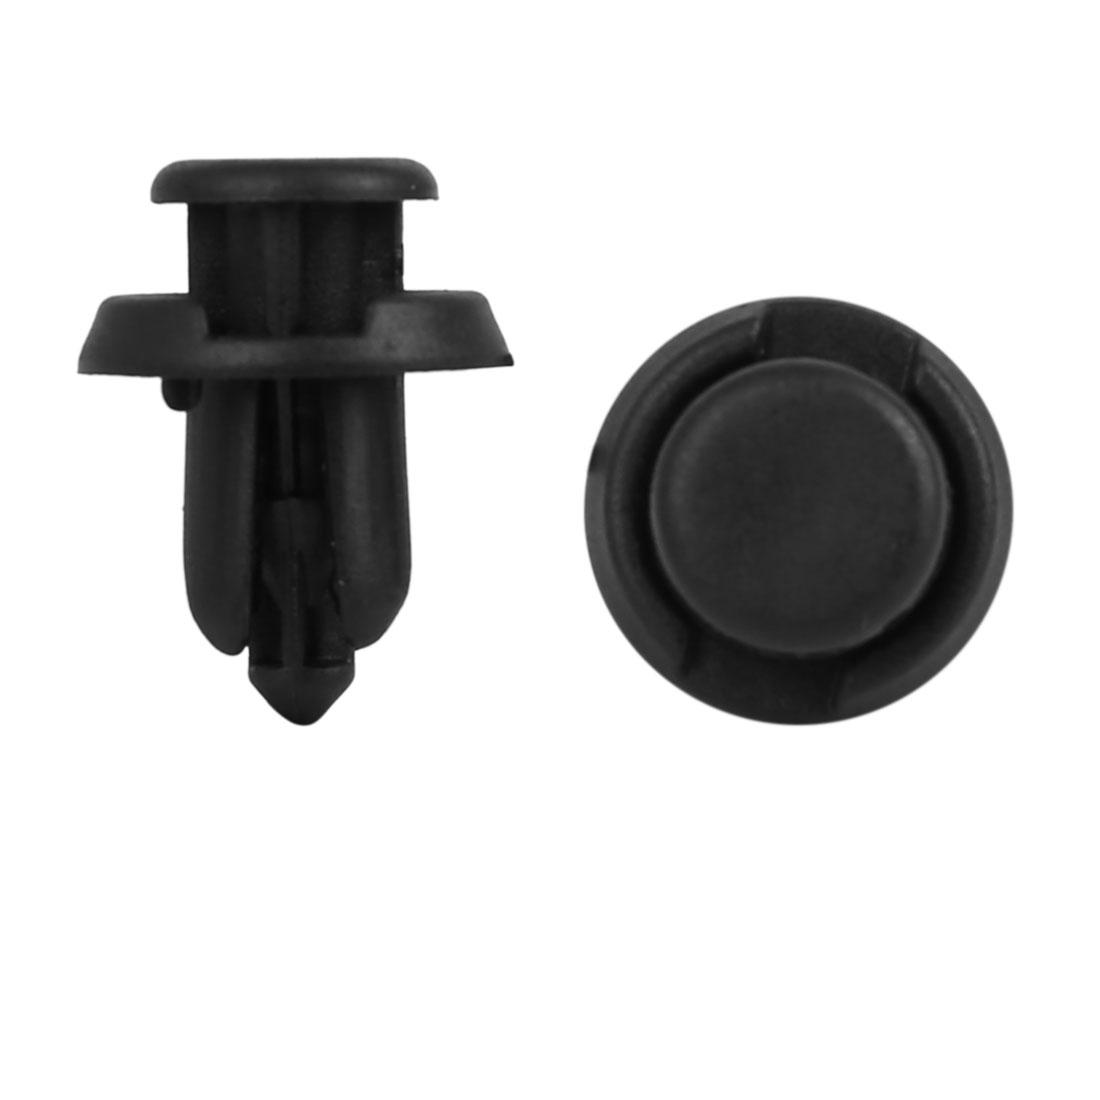 17Pcs 10mm Black Plastic Rivets Push Type Trunk Retainer Fastener Clip for Car